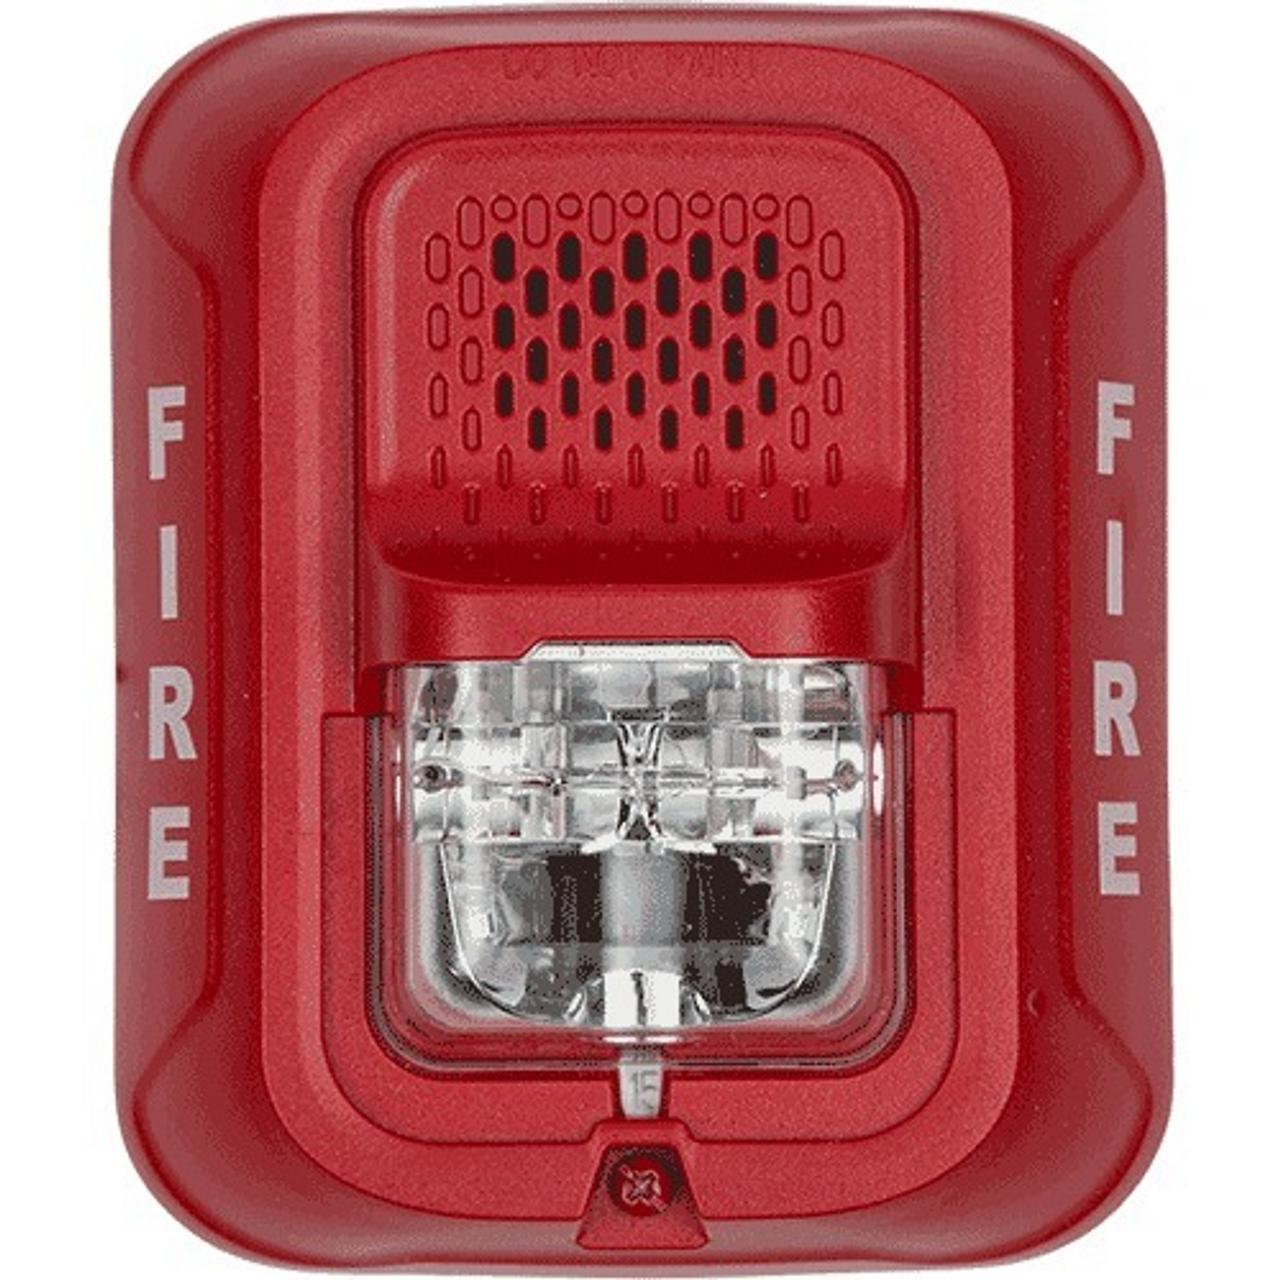 System Sensor P2RL 2 Wire Wall Siren/Strobe, Red